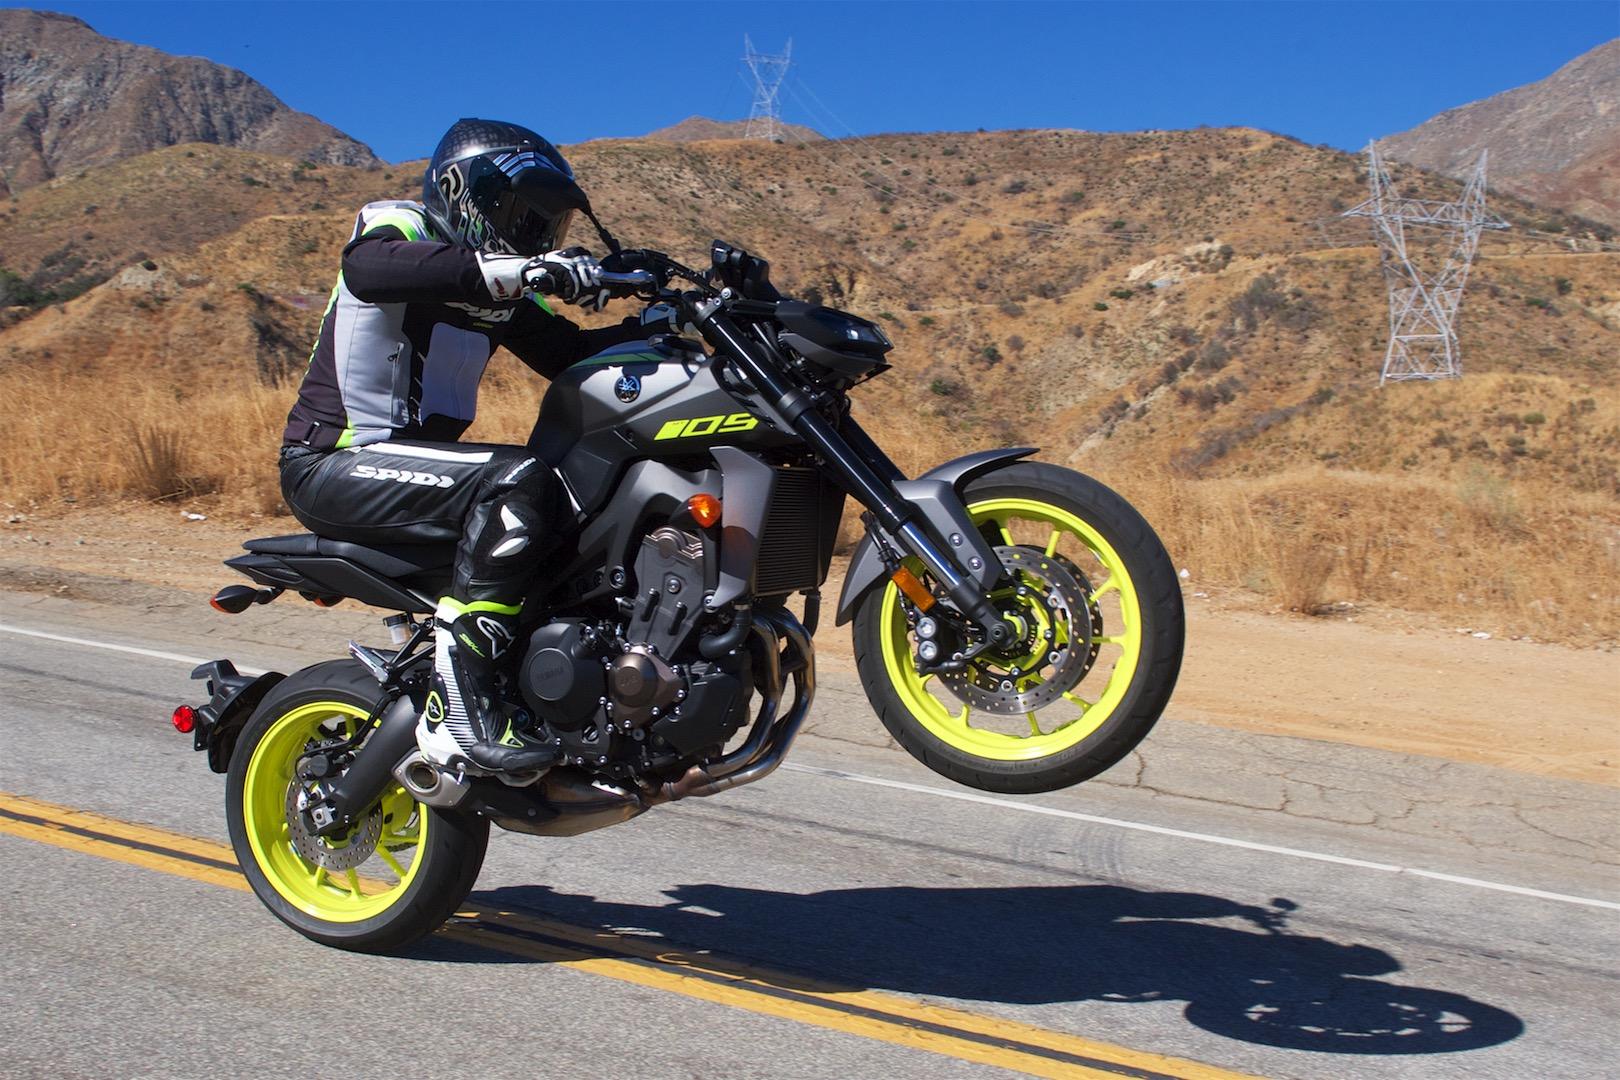 YAMAHA MT-09 SP 2018 850 cm3 | moto roadster | 6 600 km